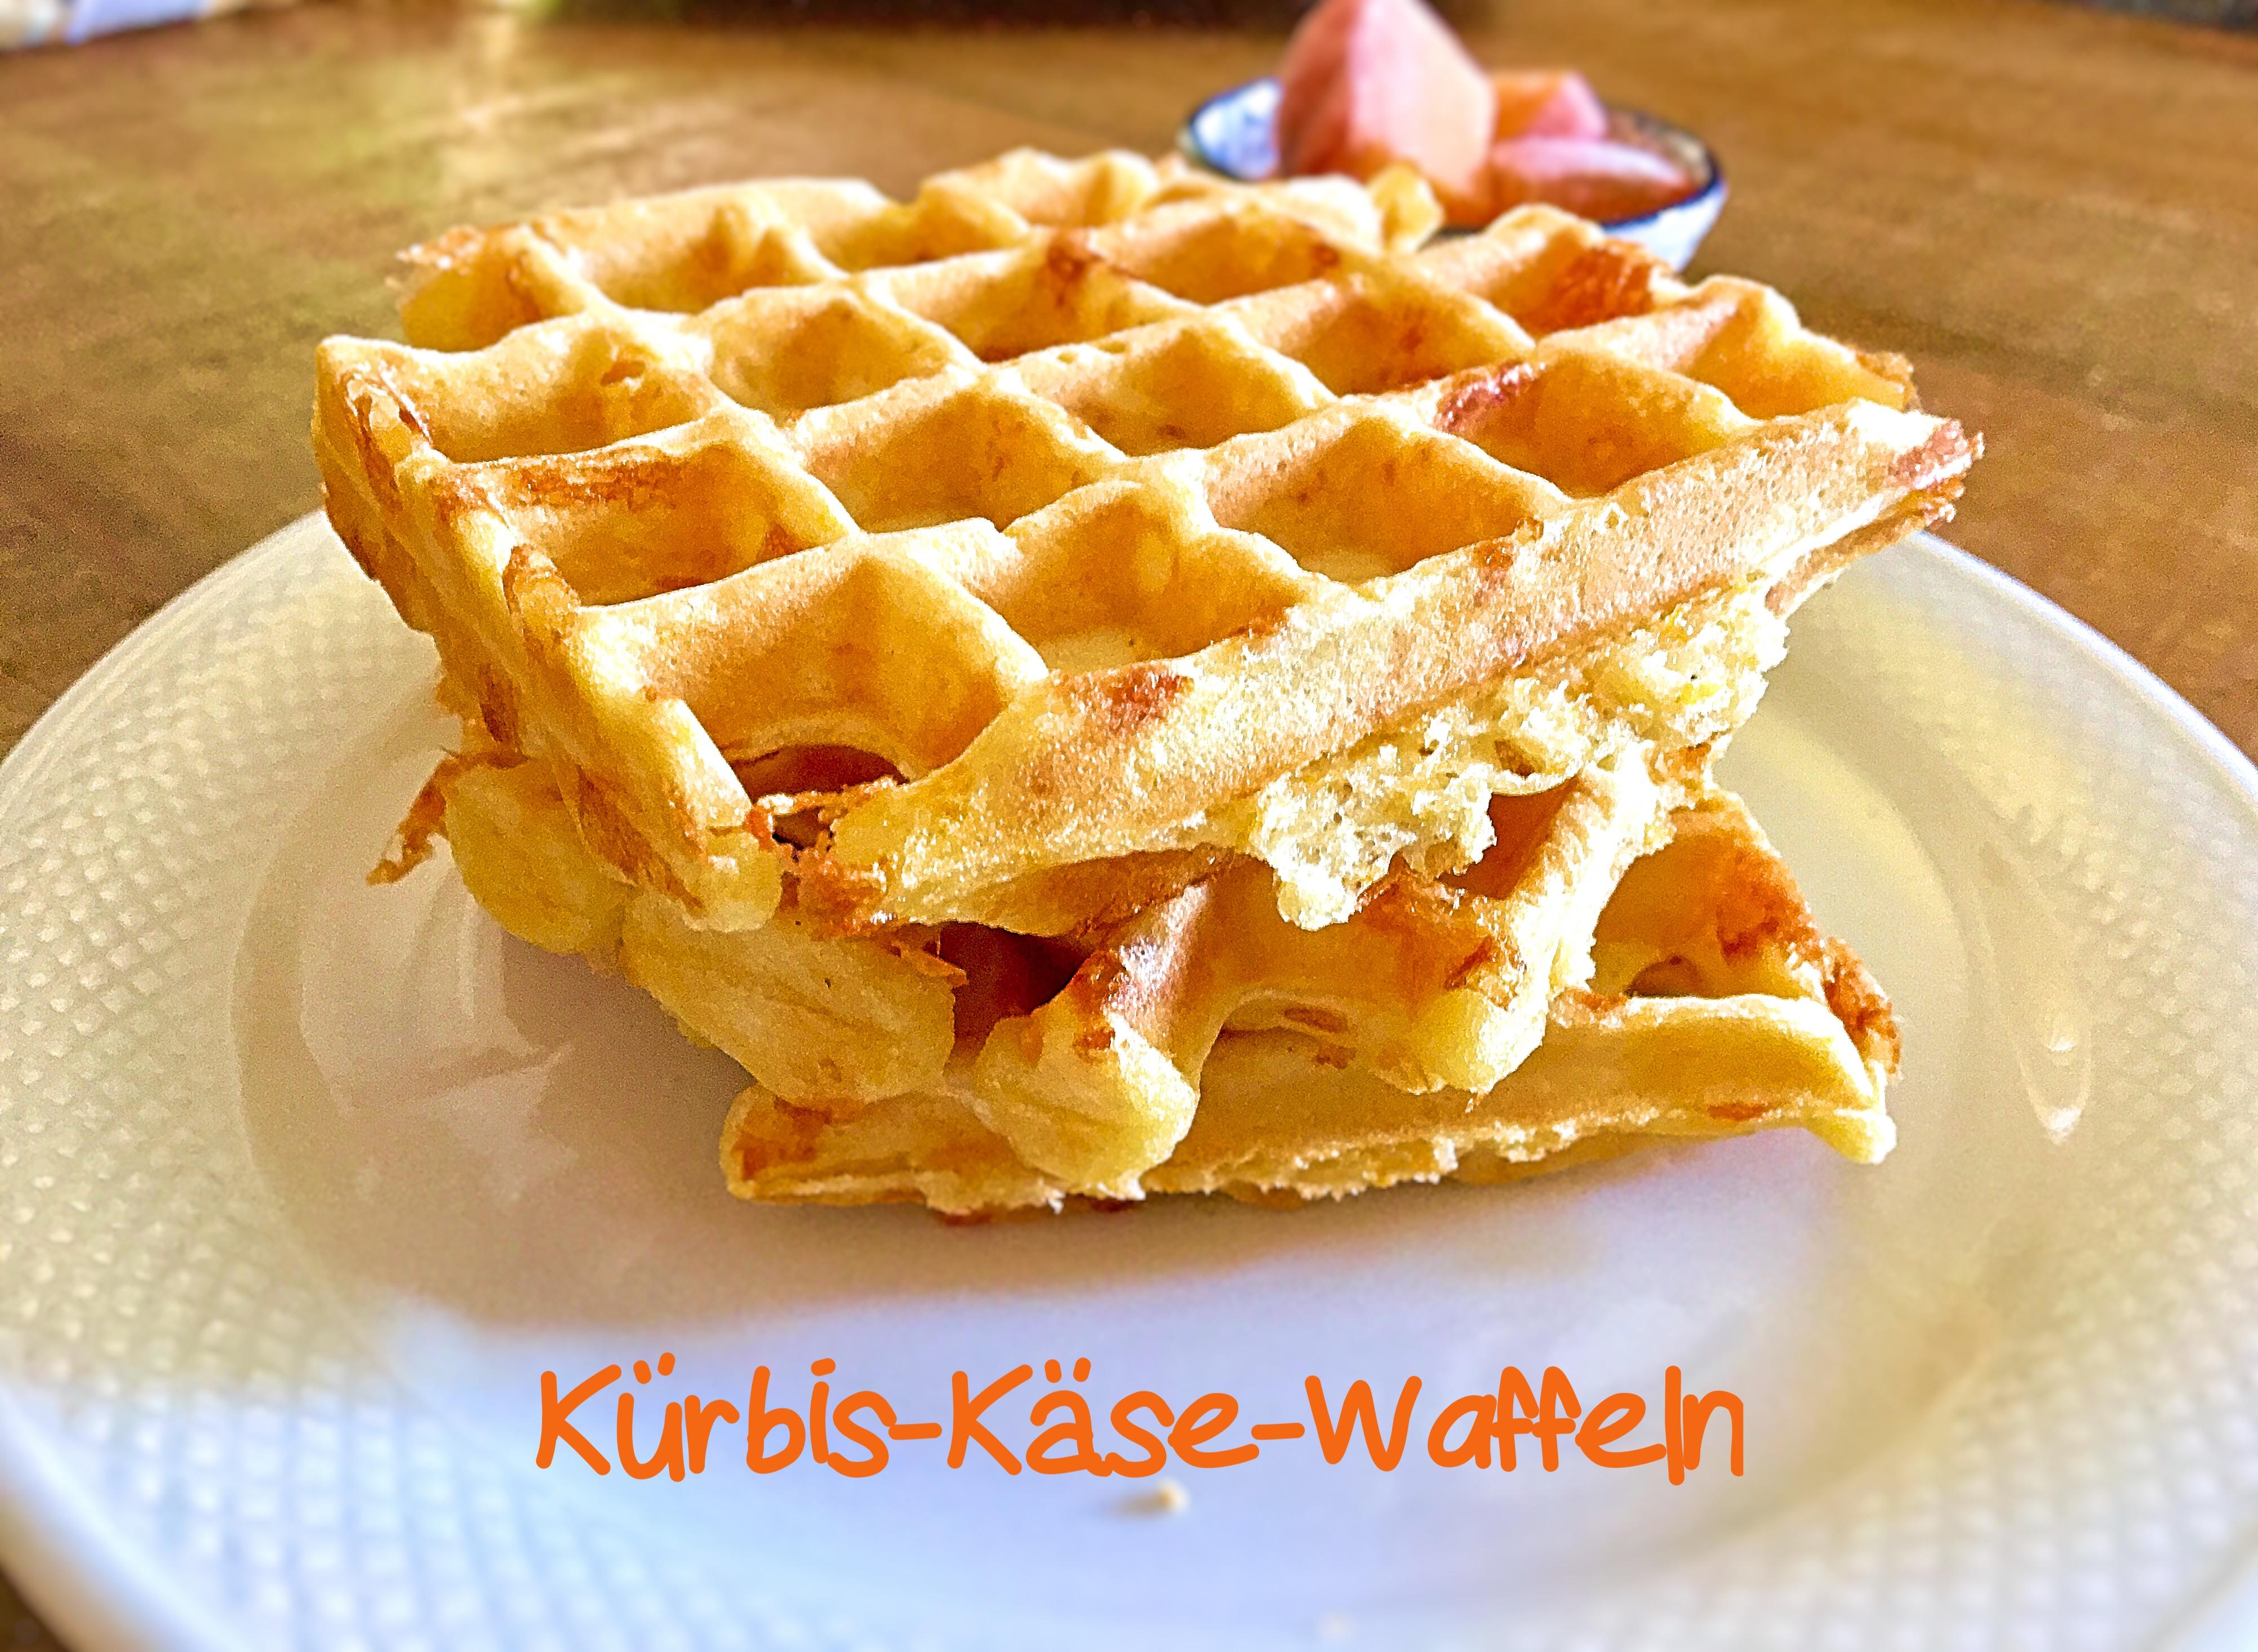 Kürbis-Käse-Waffeln